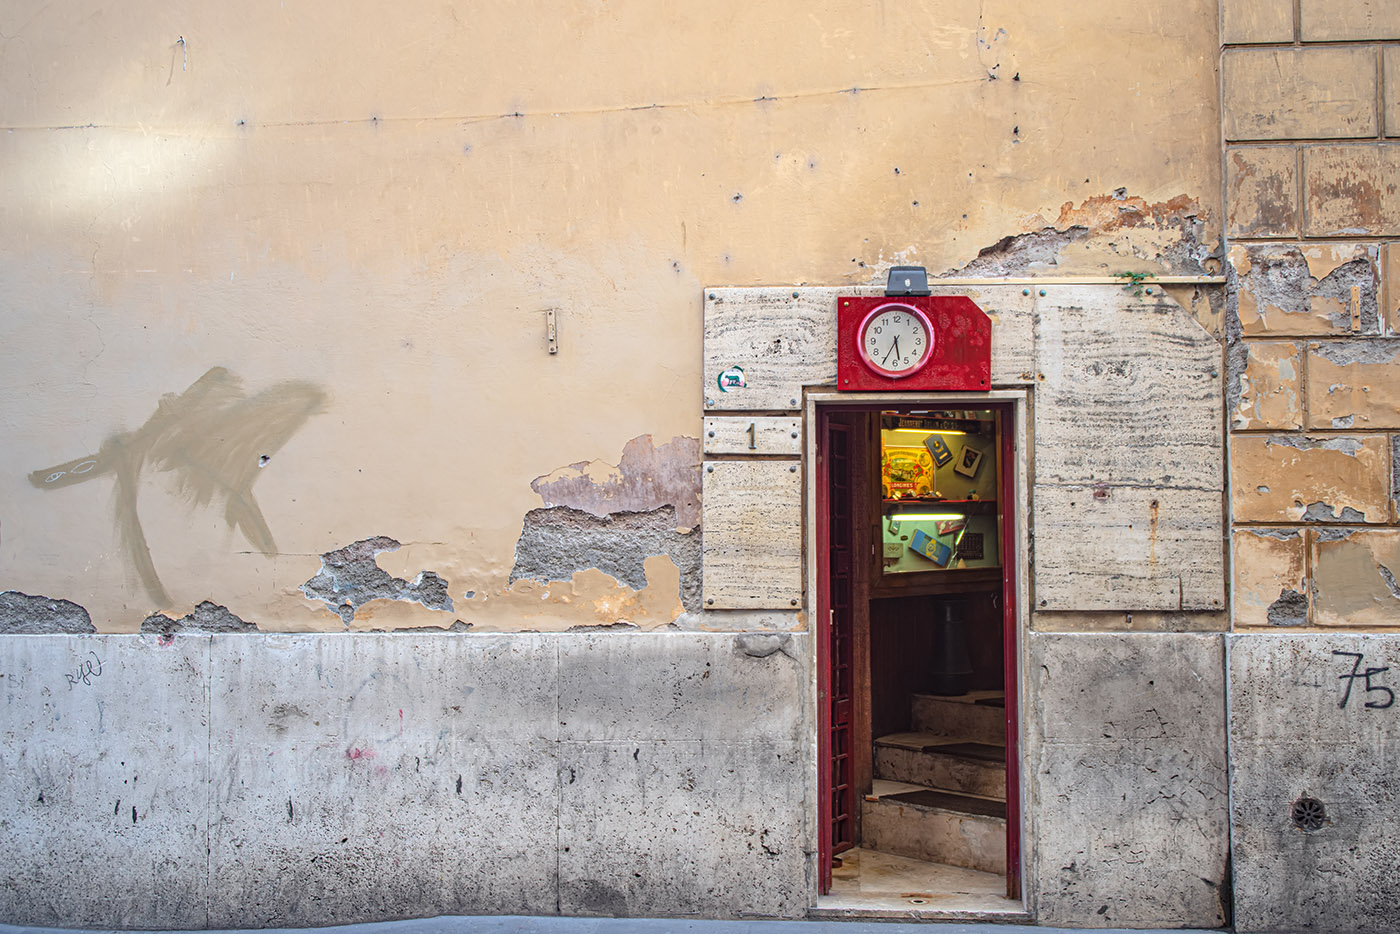 Giuseppe Francavilla: Tempus fugit (Time Flies)